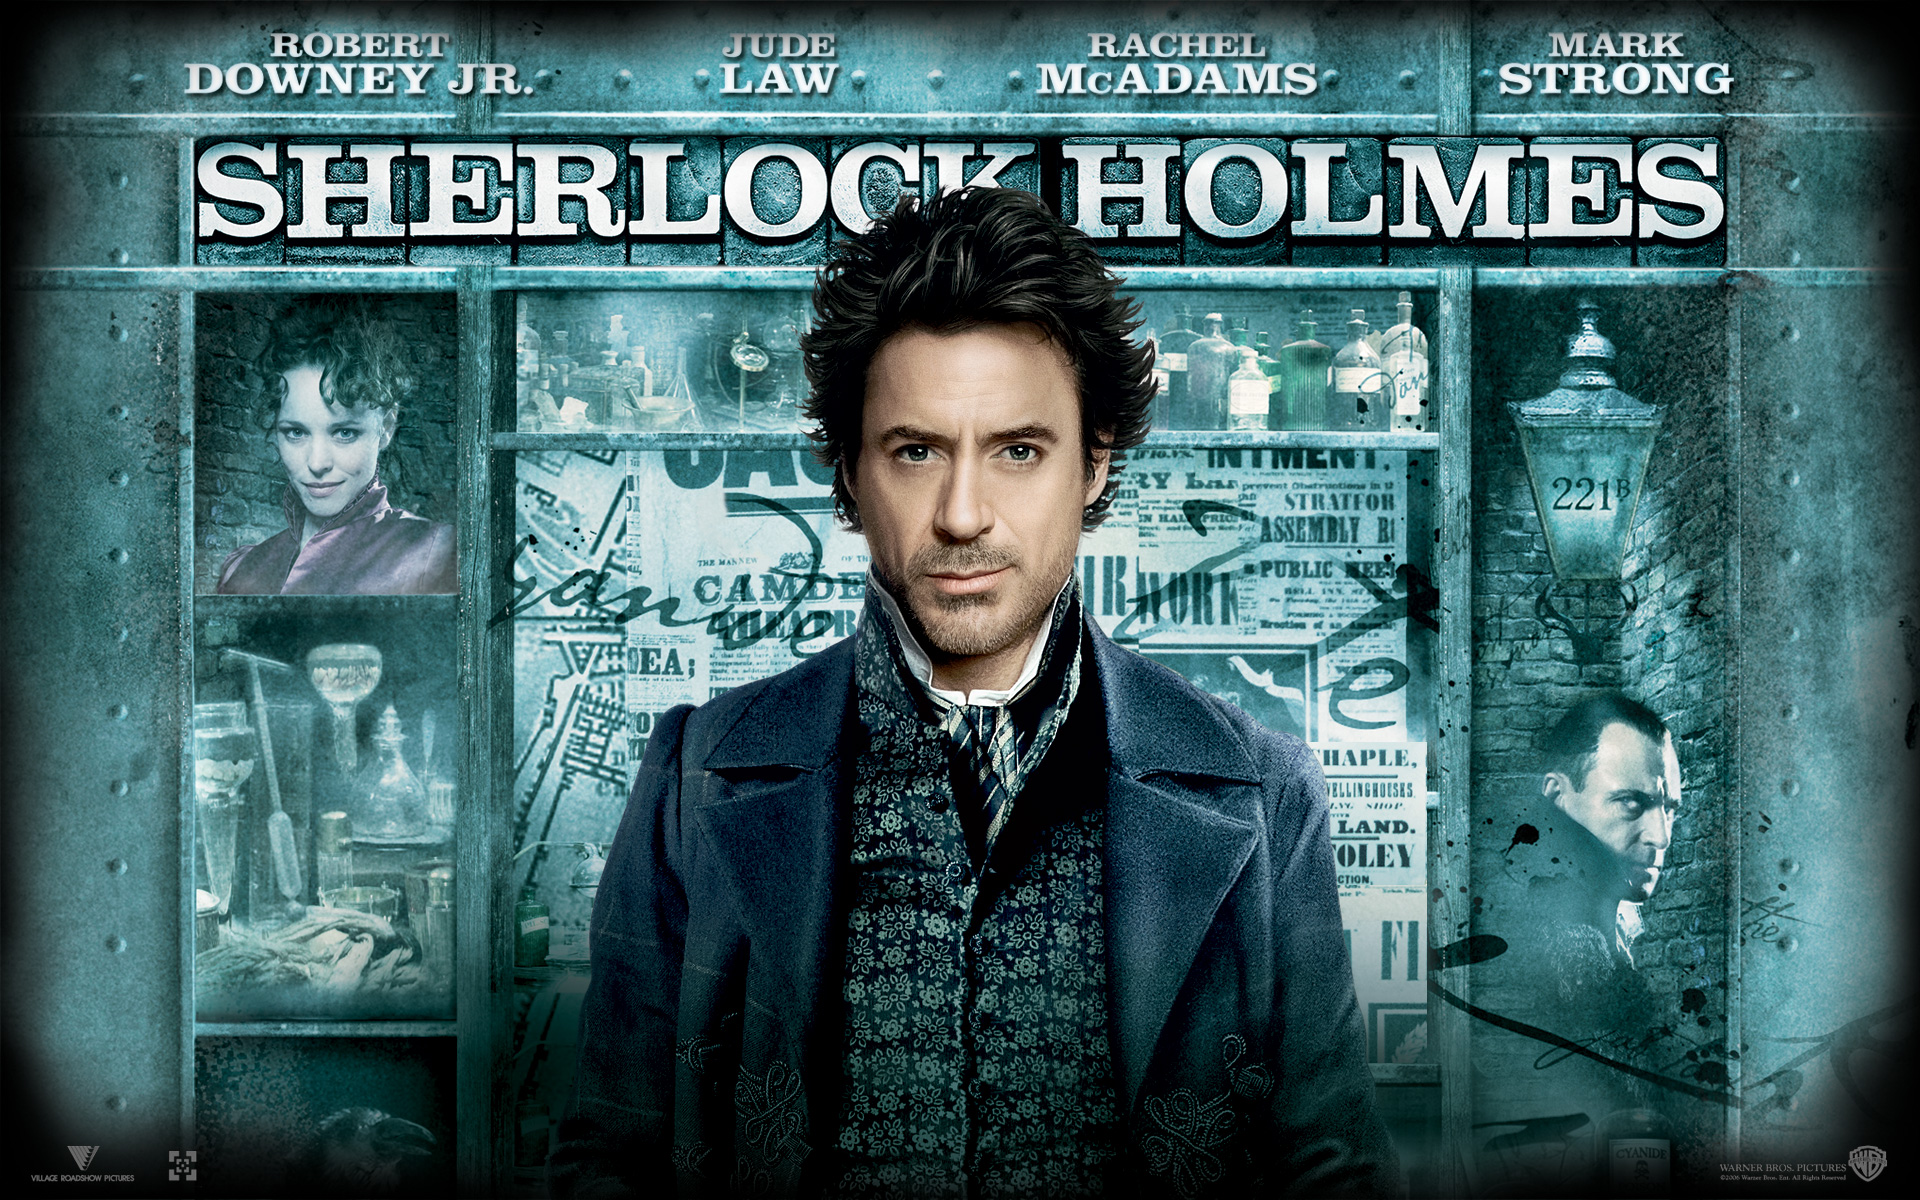 Robert Downey Jr Sherlock Holmes Wallpaper Wallpapersafari